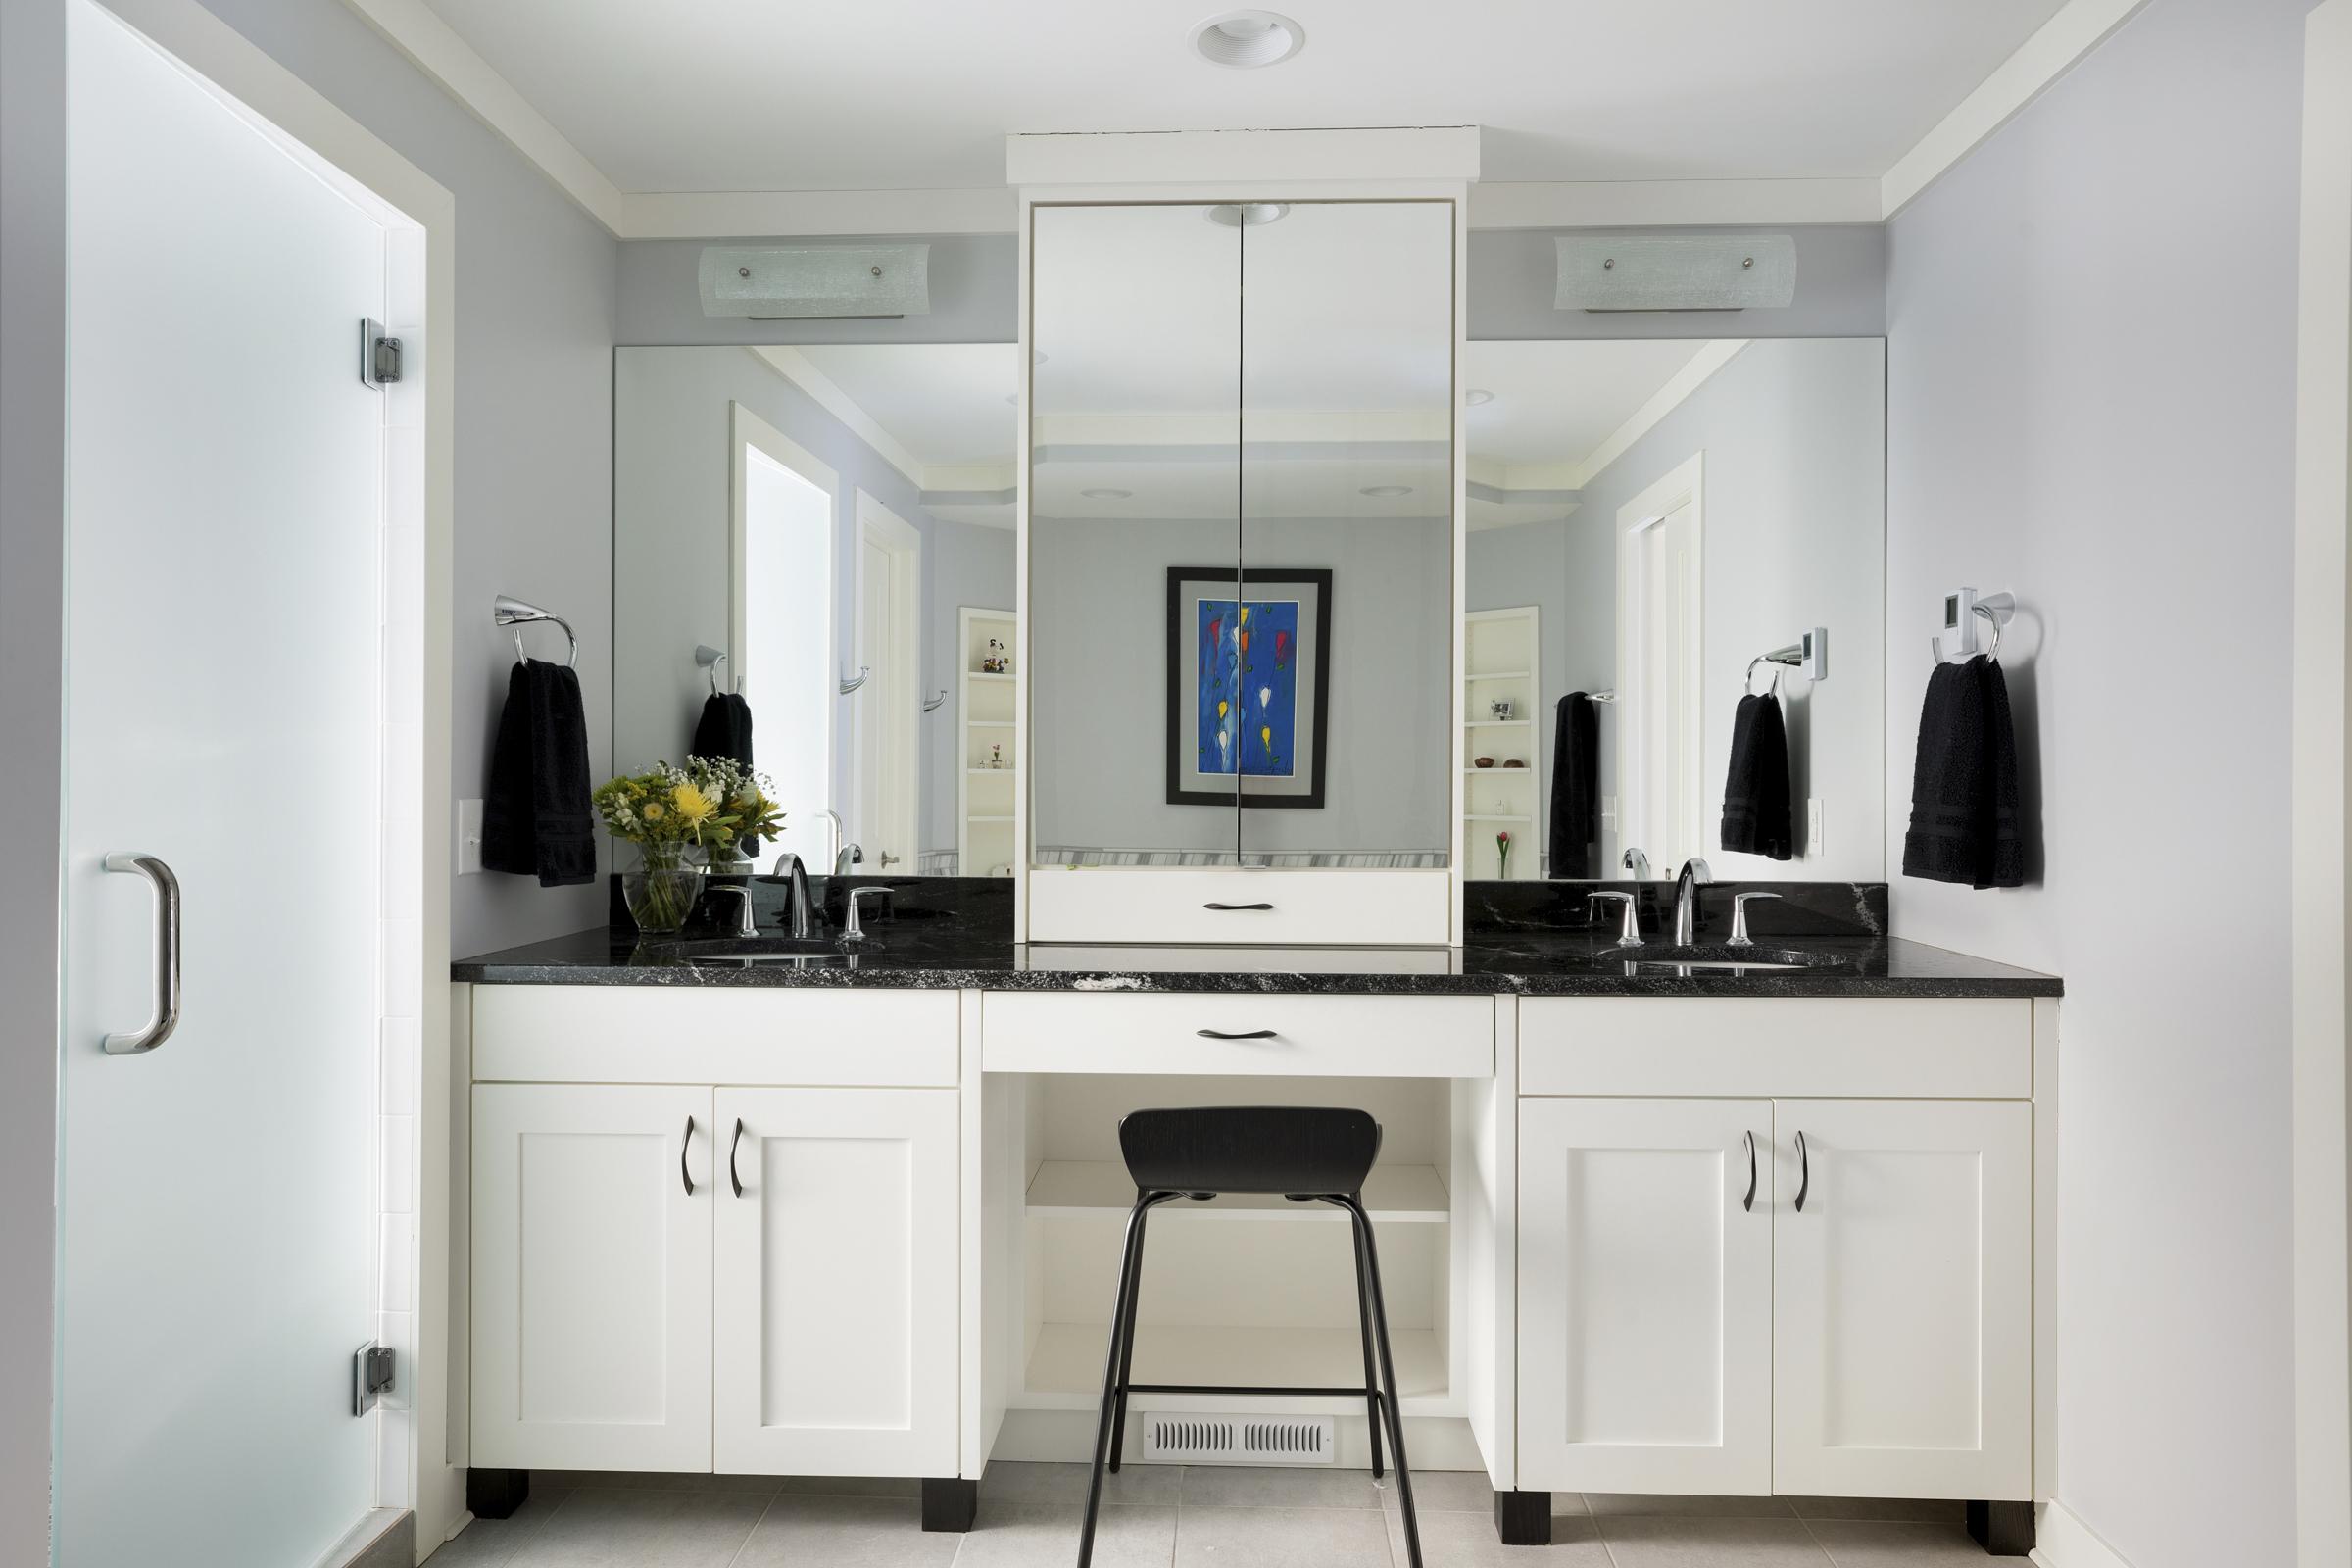 Bathroom Remodel Minneapolis Decorative Concrete Vanity Bathroom Remodel Custom Concrete